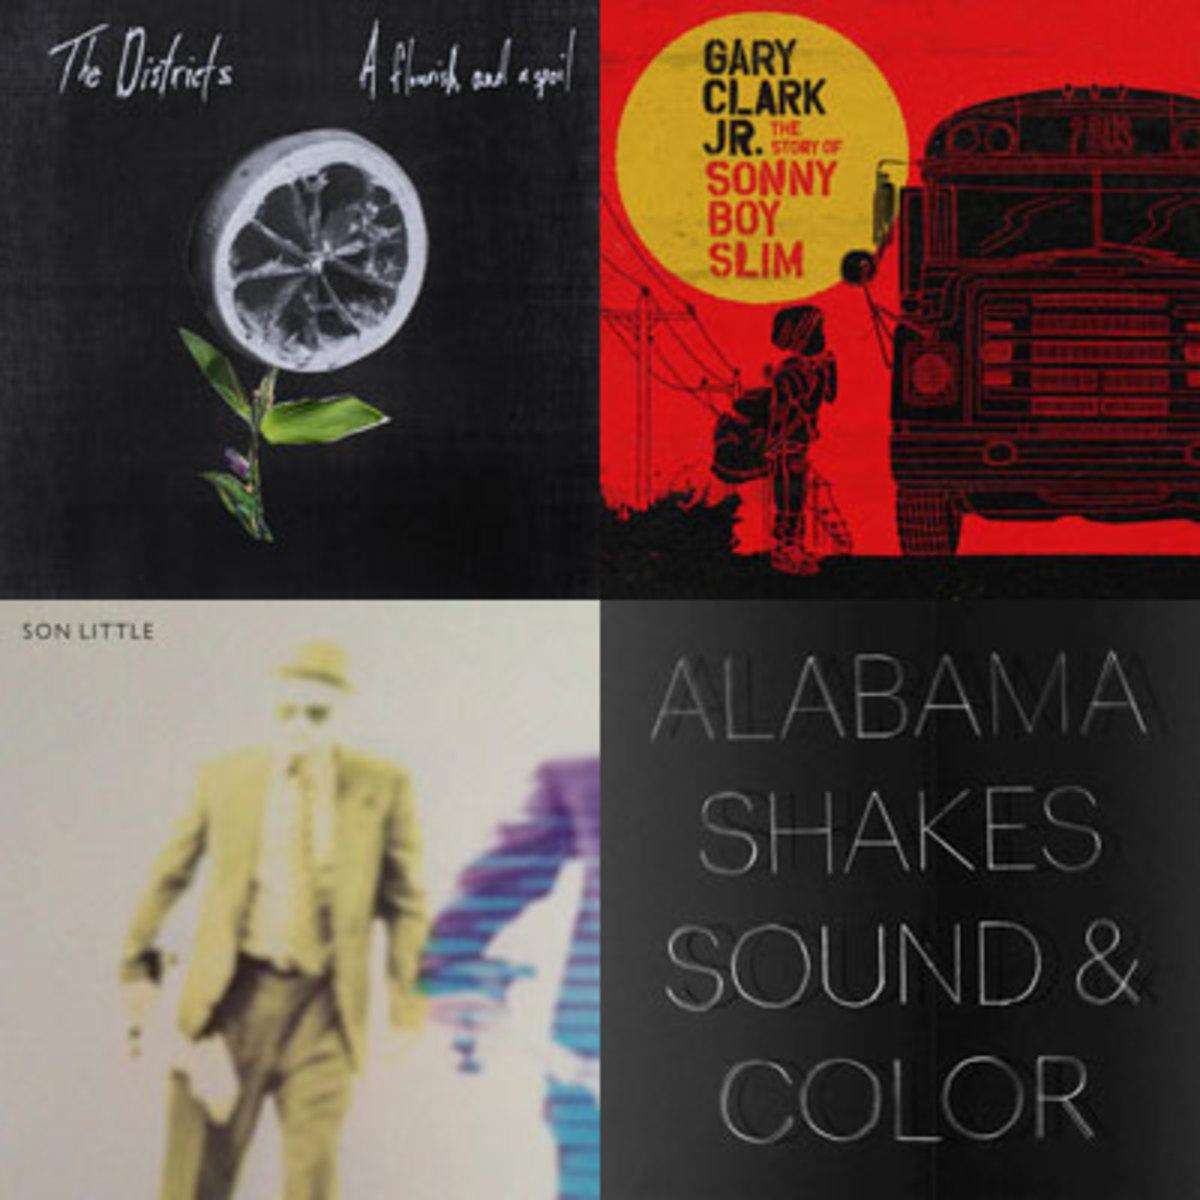 best-non-hip-hop-album-2015.jpg